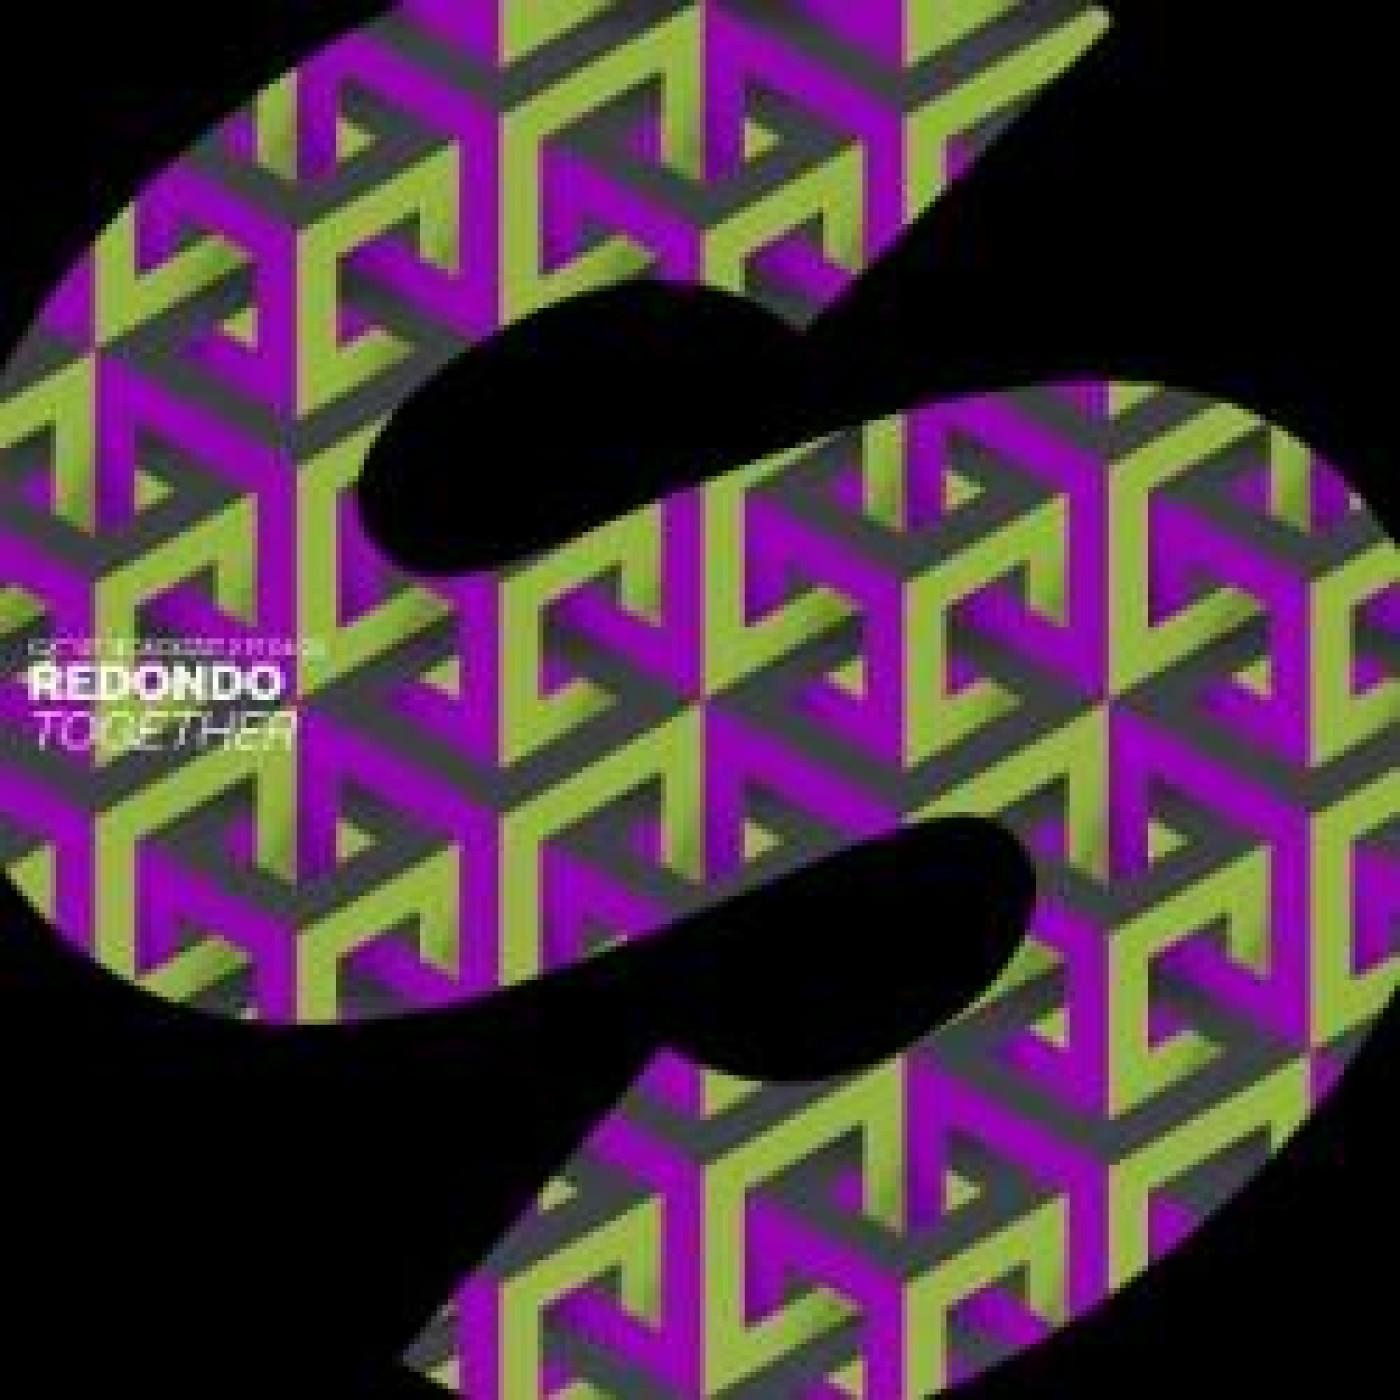 Music News de La Matinale FG : Together de Redondo